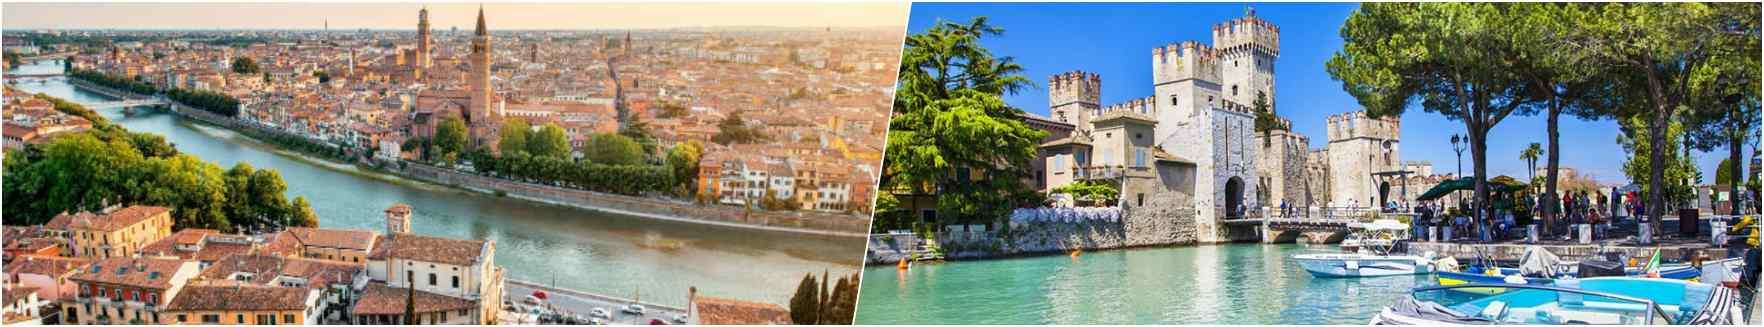 Venice-Sirmione